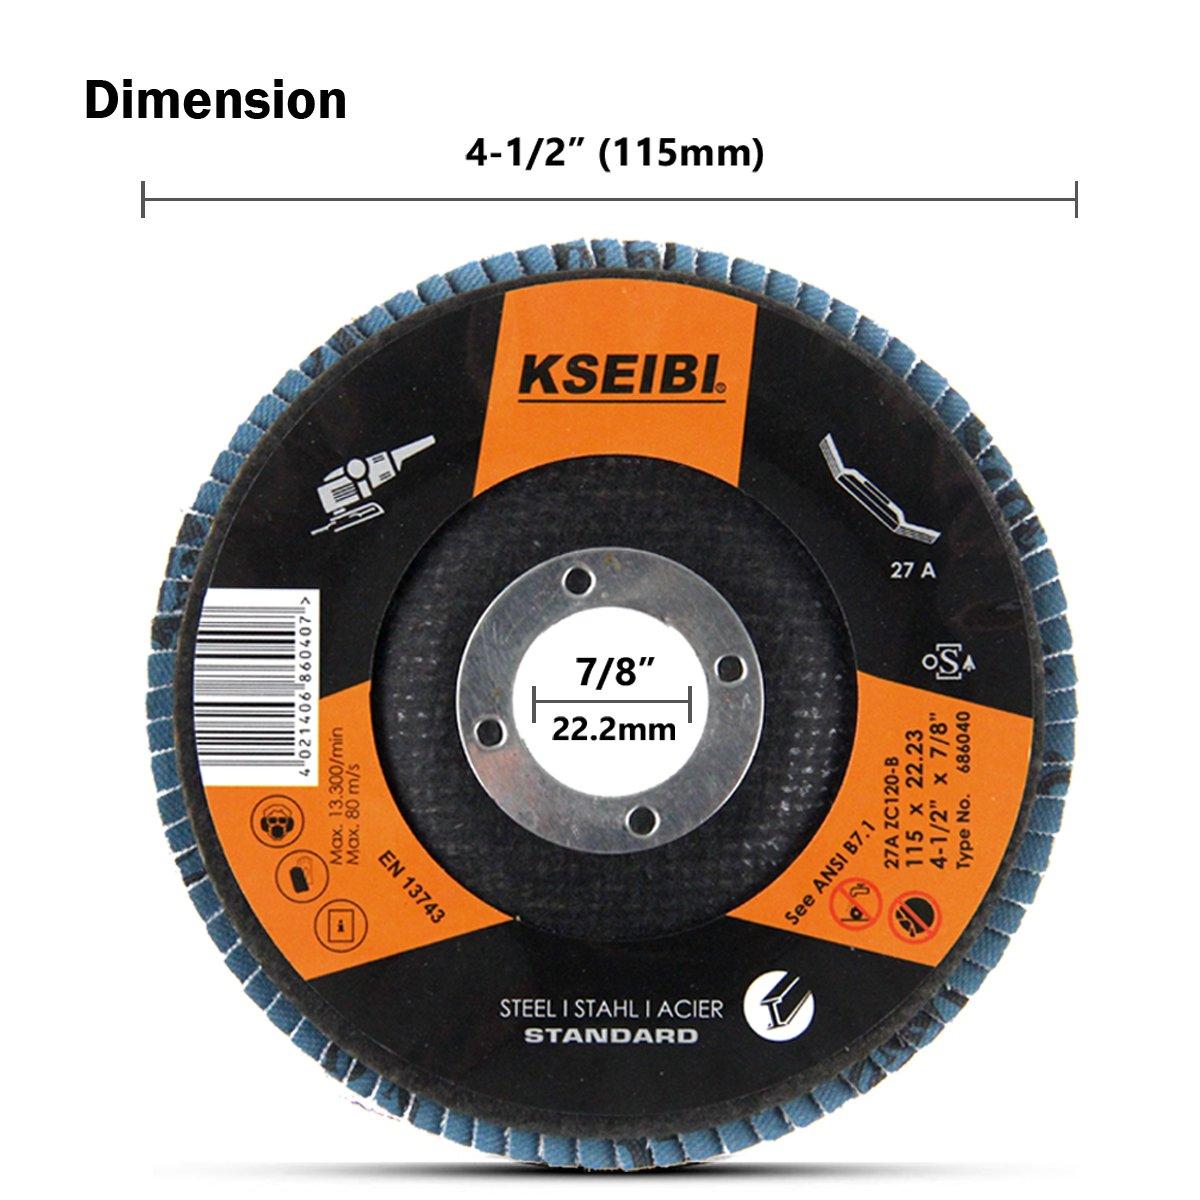 KSEIBI Zirconia Corundum 4 1/2 Inch Flap Disc Sanding Grinding Wheel (Grit #40, Blue) by KSEIBI (Image #4)